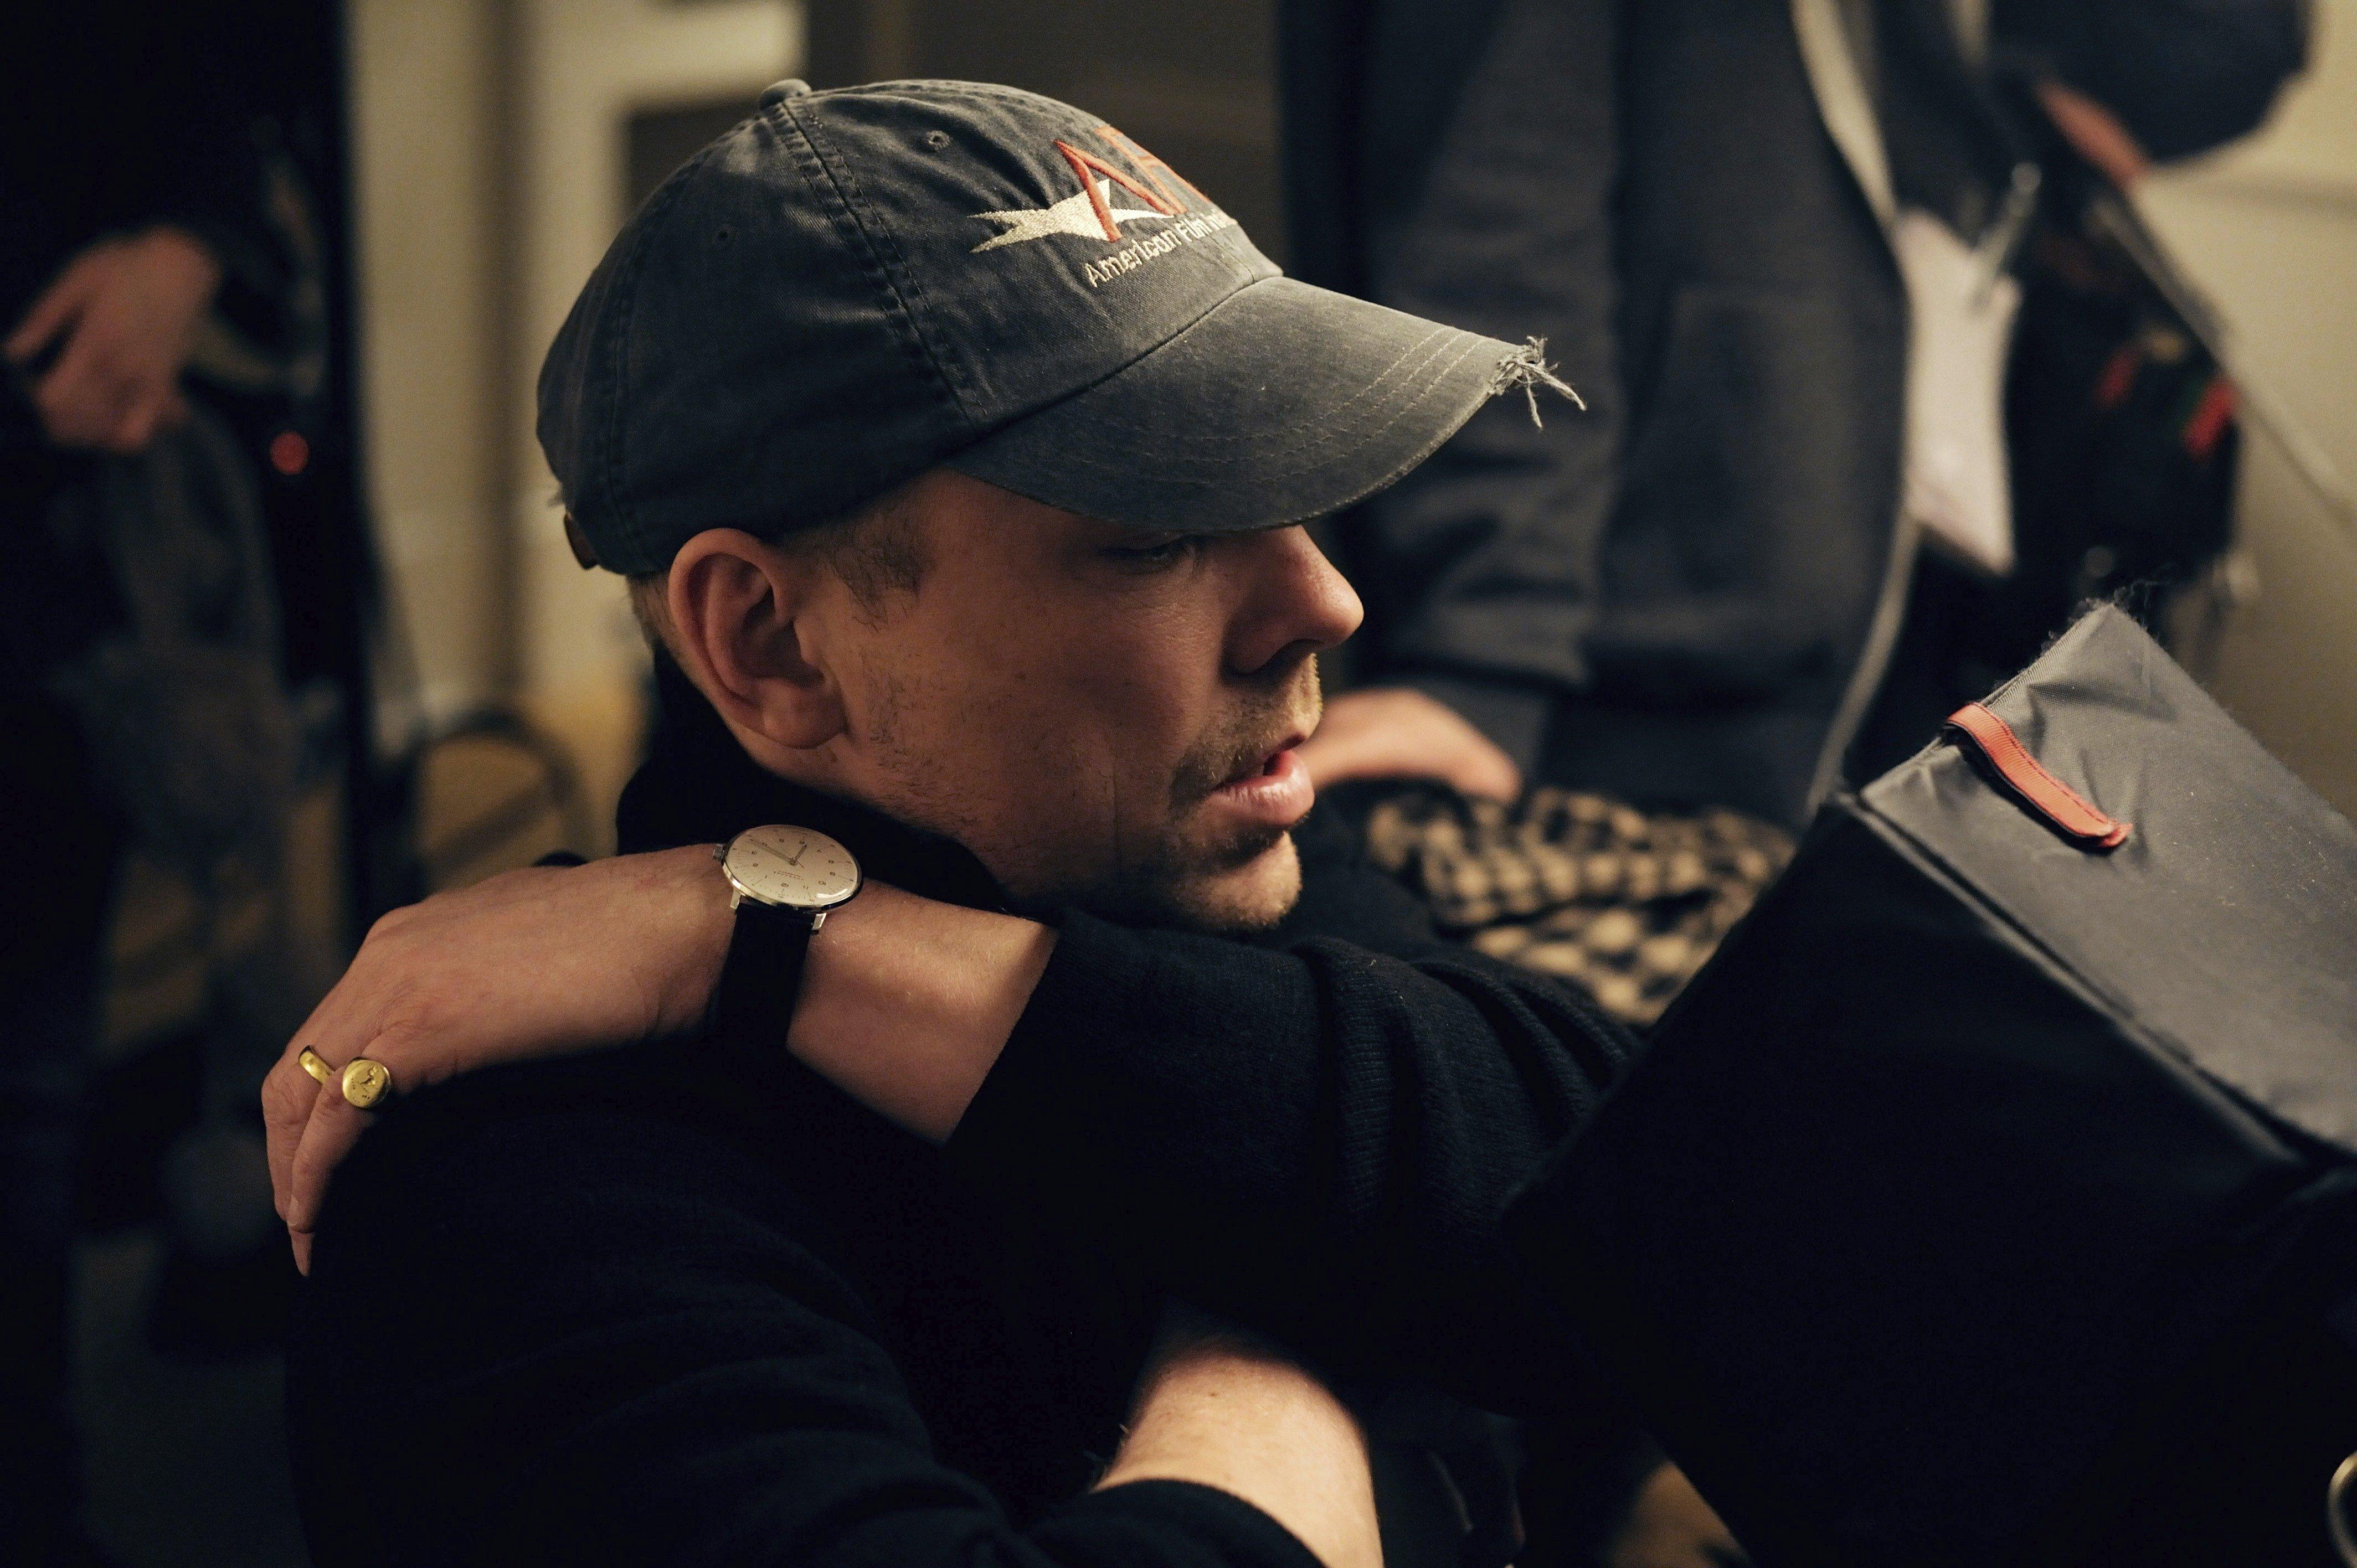 Behind the Scenes - Love/Me/Do Writer/Director - Martin Stitt